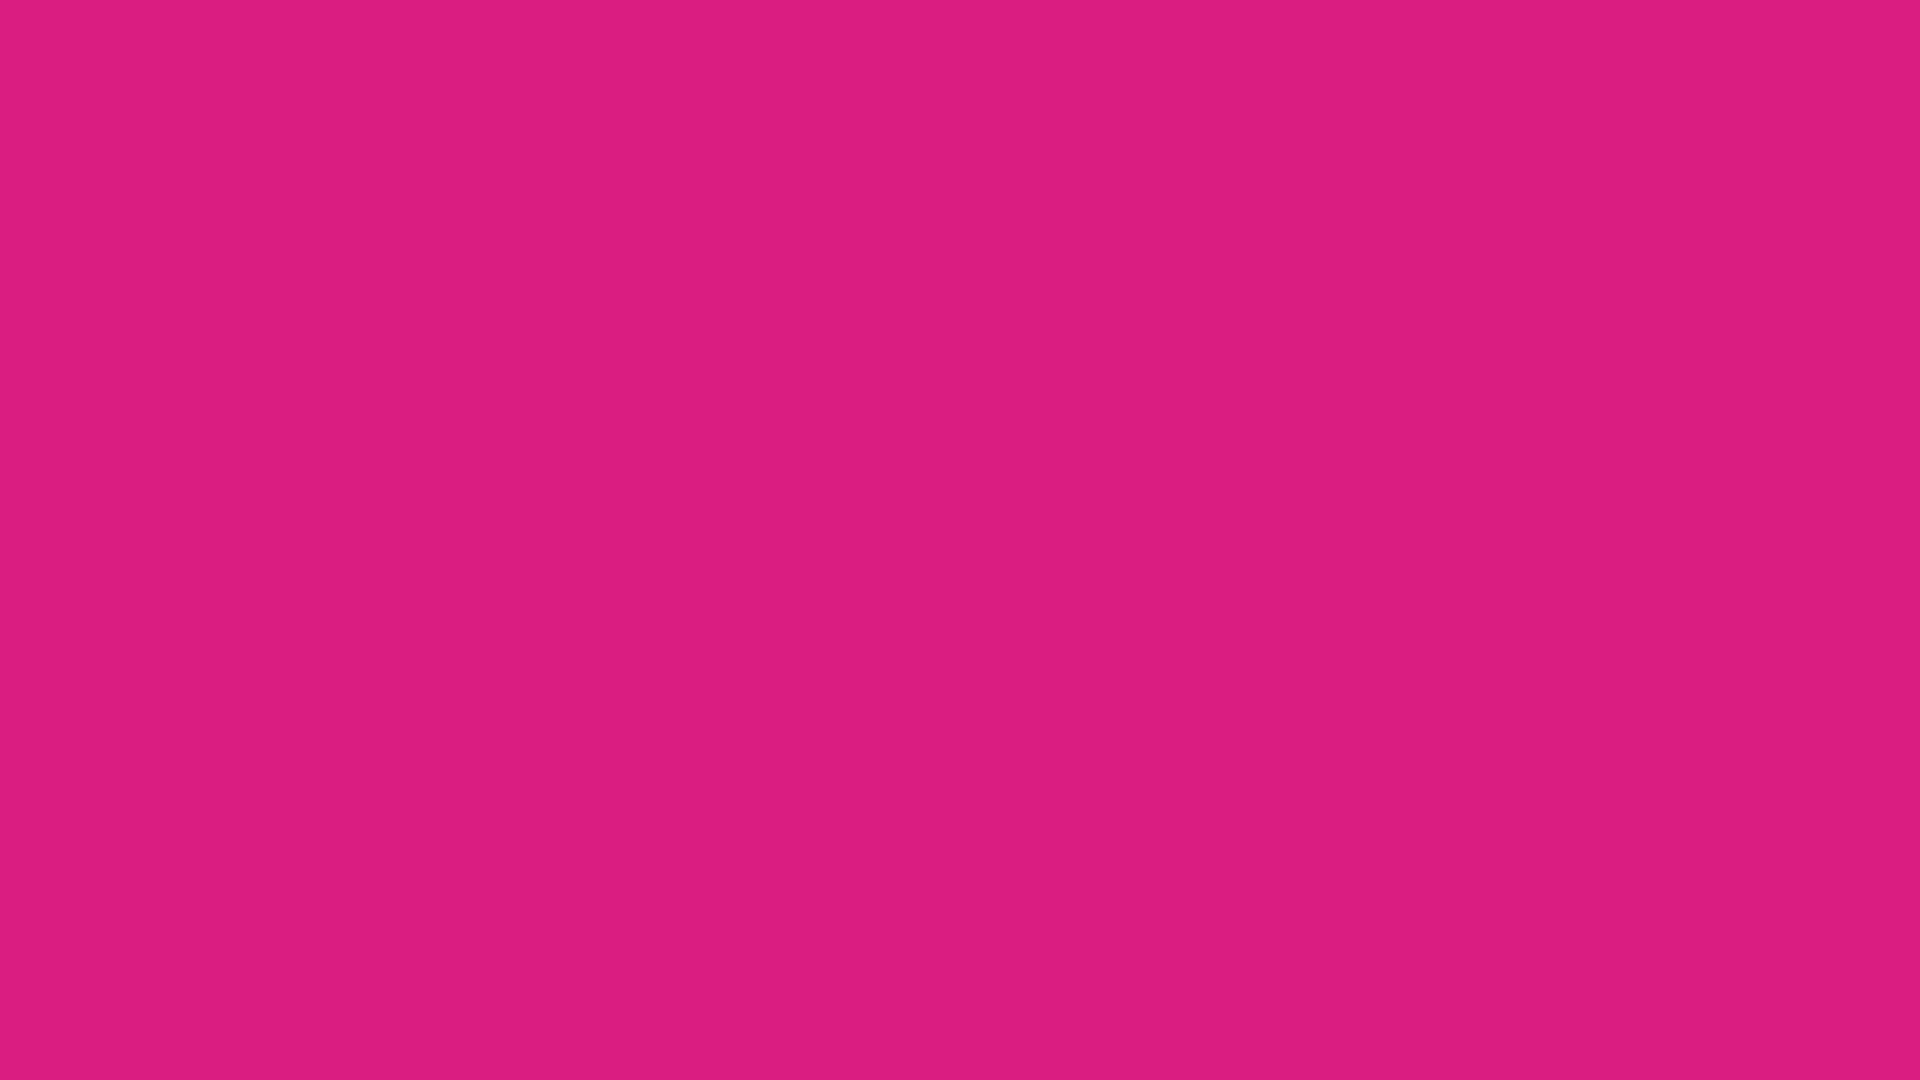 1920x1080 Vivid Cerise Solid Color Background